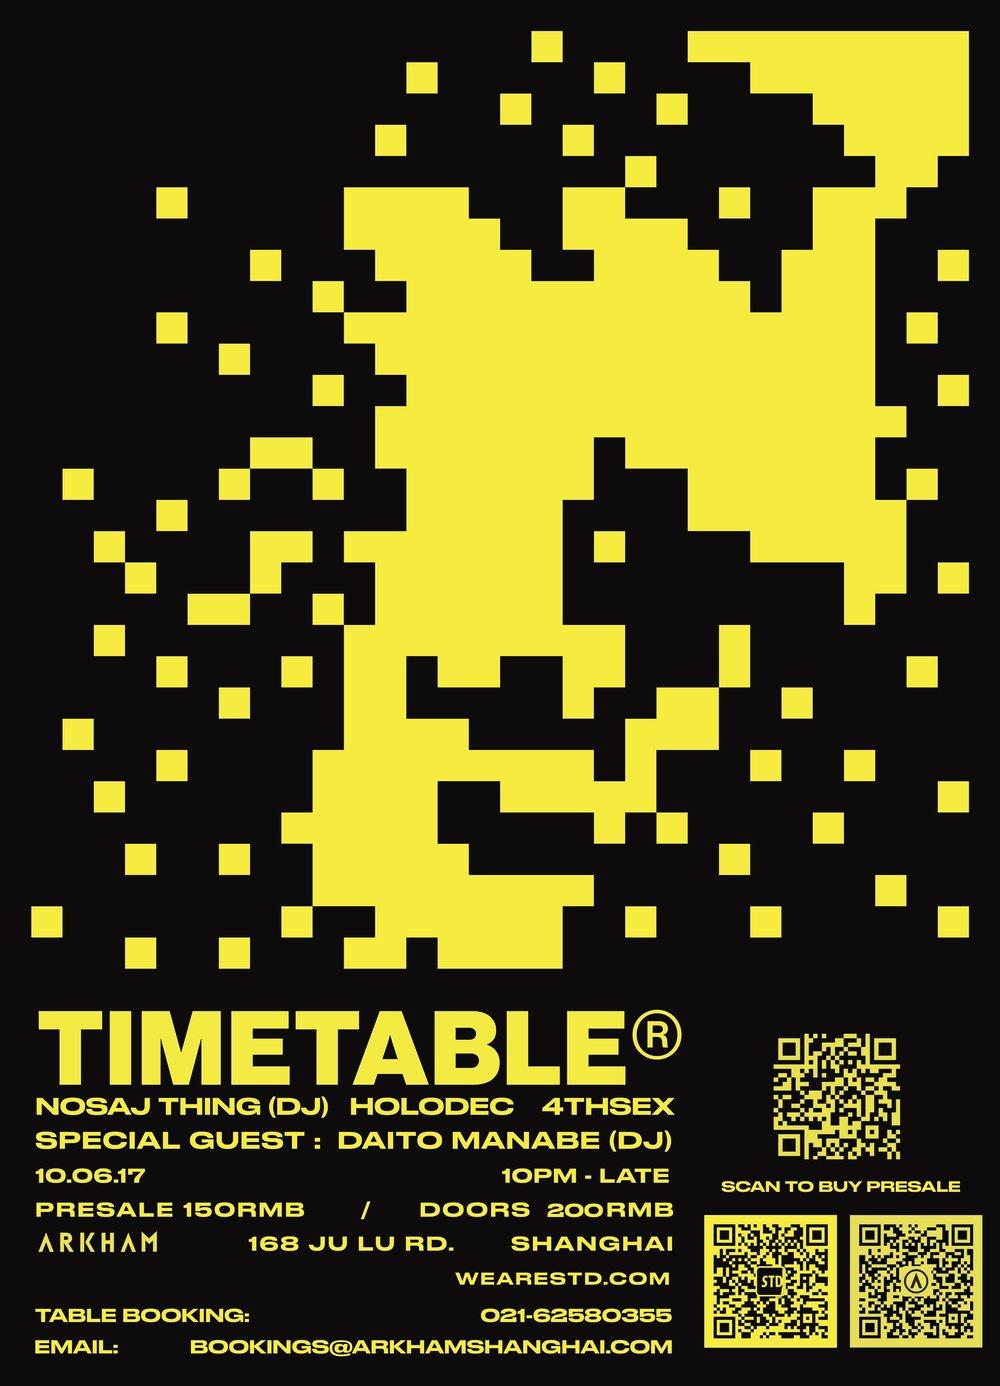 Timetable Poster.jpg